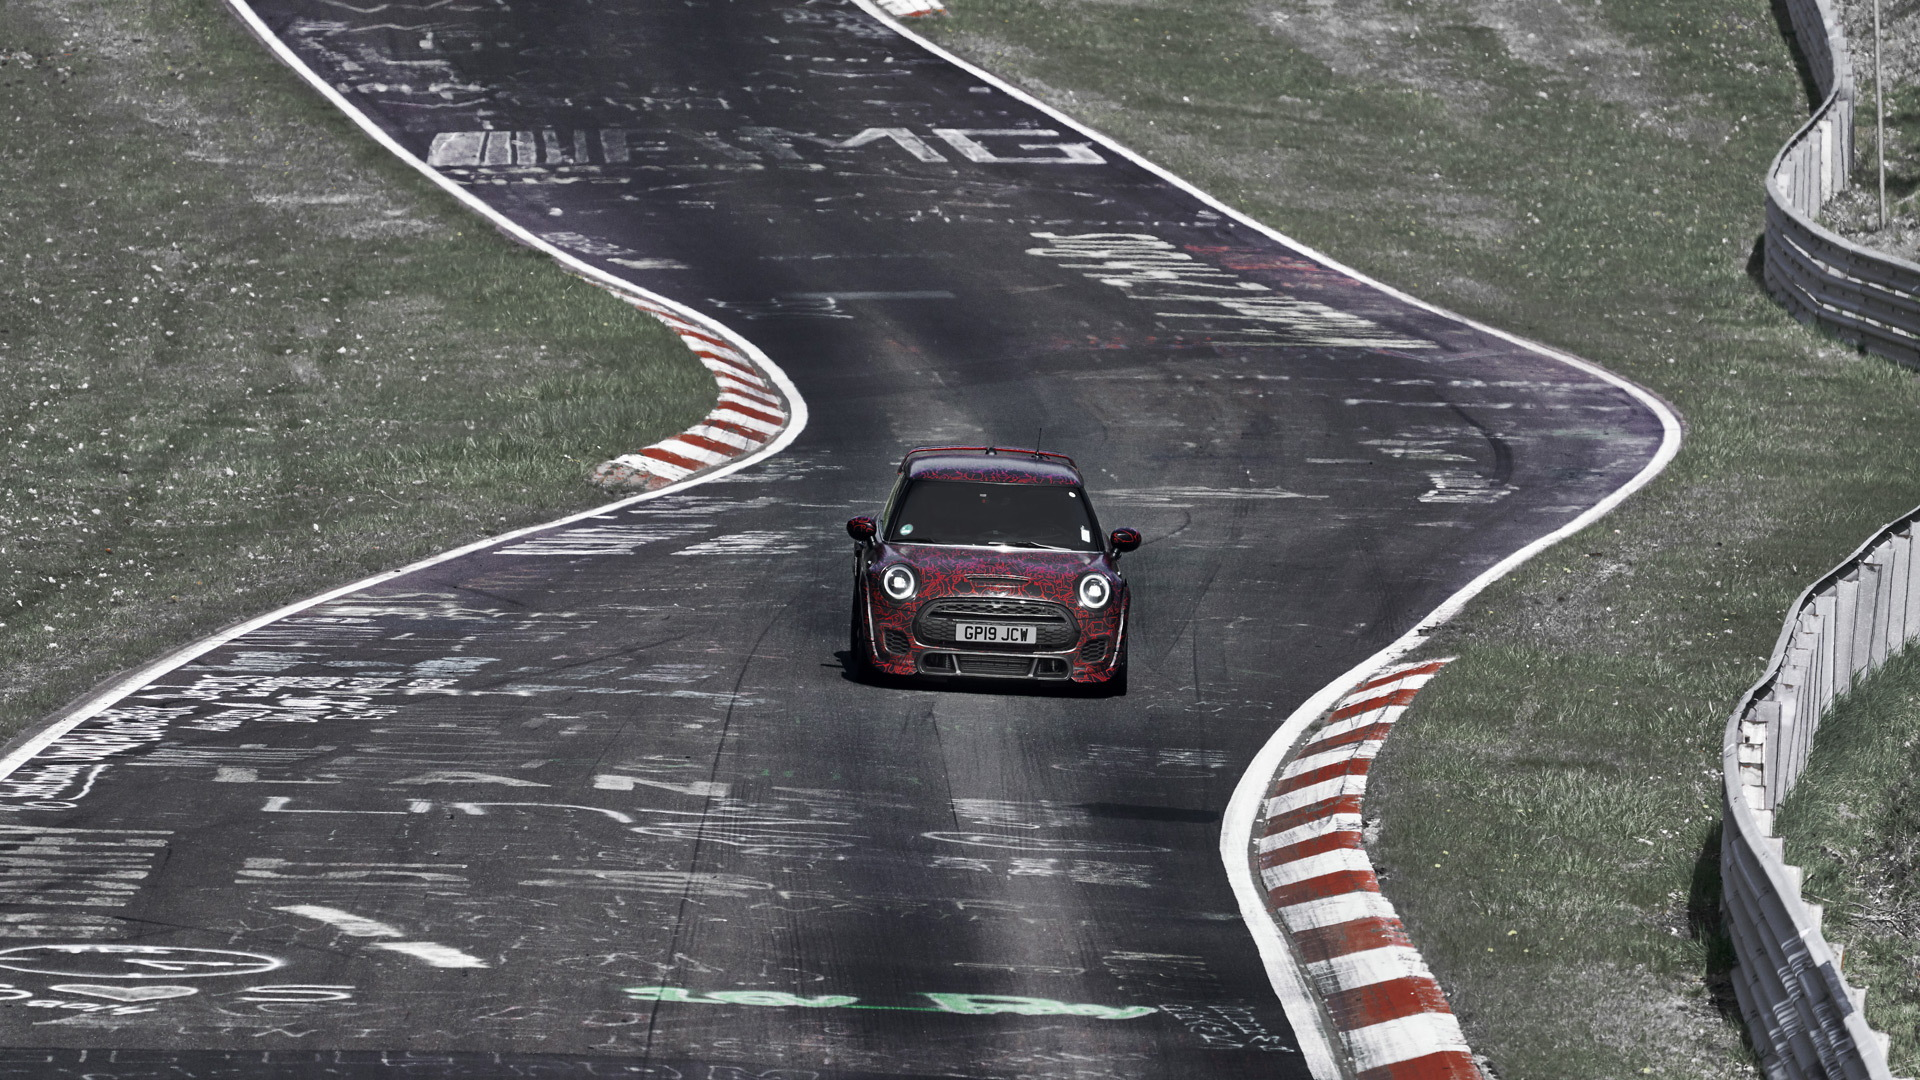 2021 Mini John Cooper Works GP prototype at the  Nürburgring